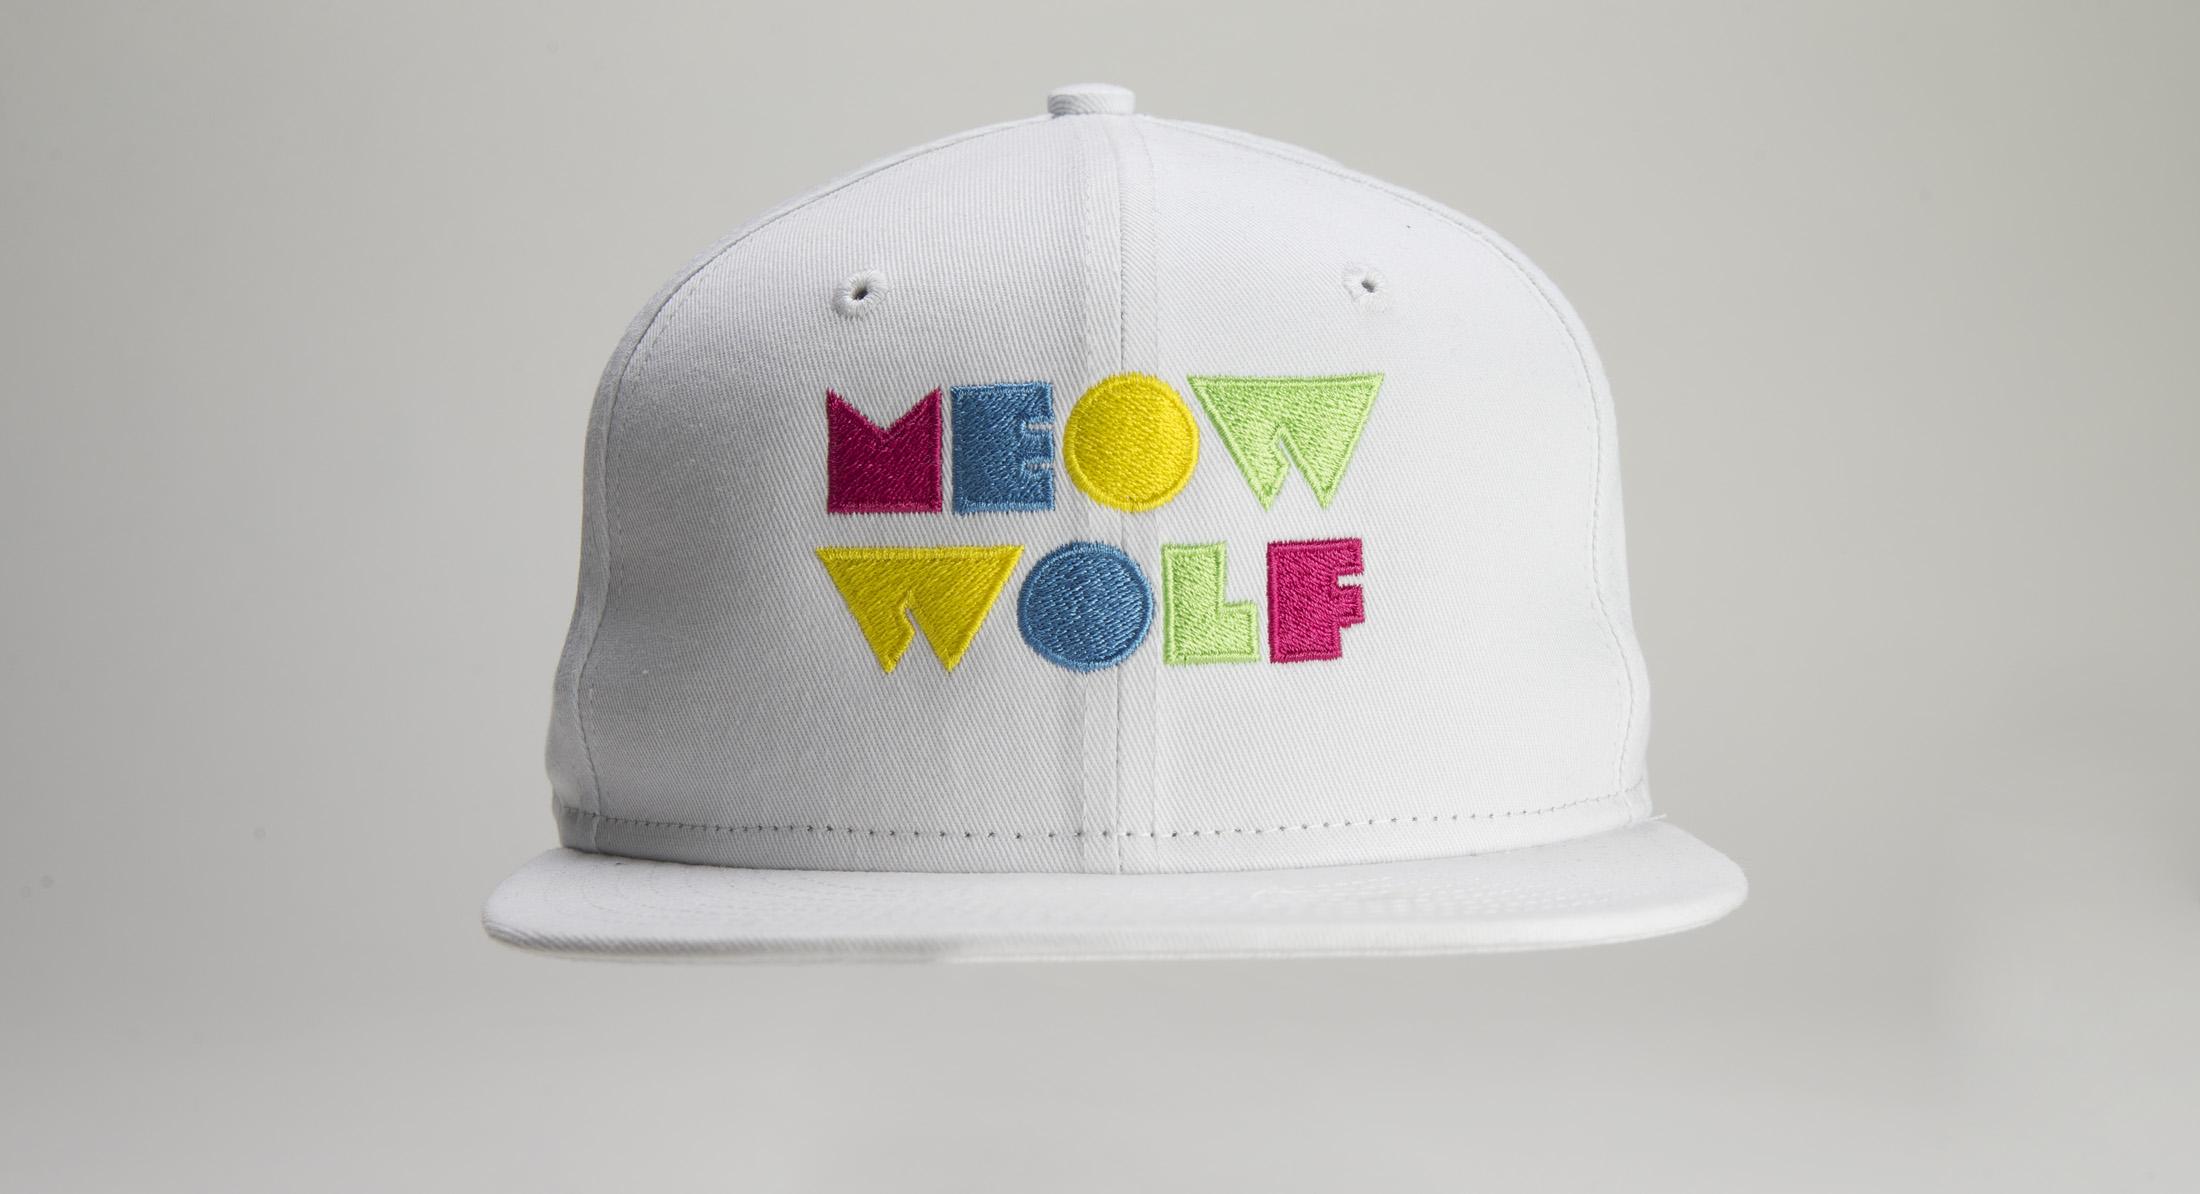 9144bce5d3f Meow Wolf Logo White 6-Panel Snapback Hat